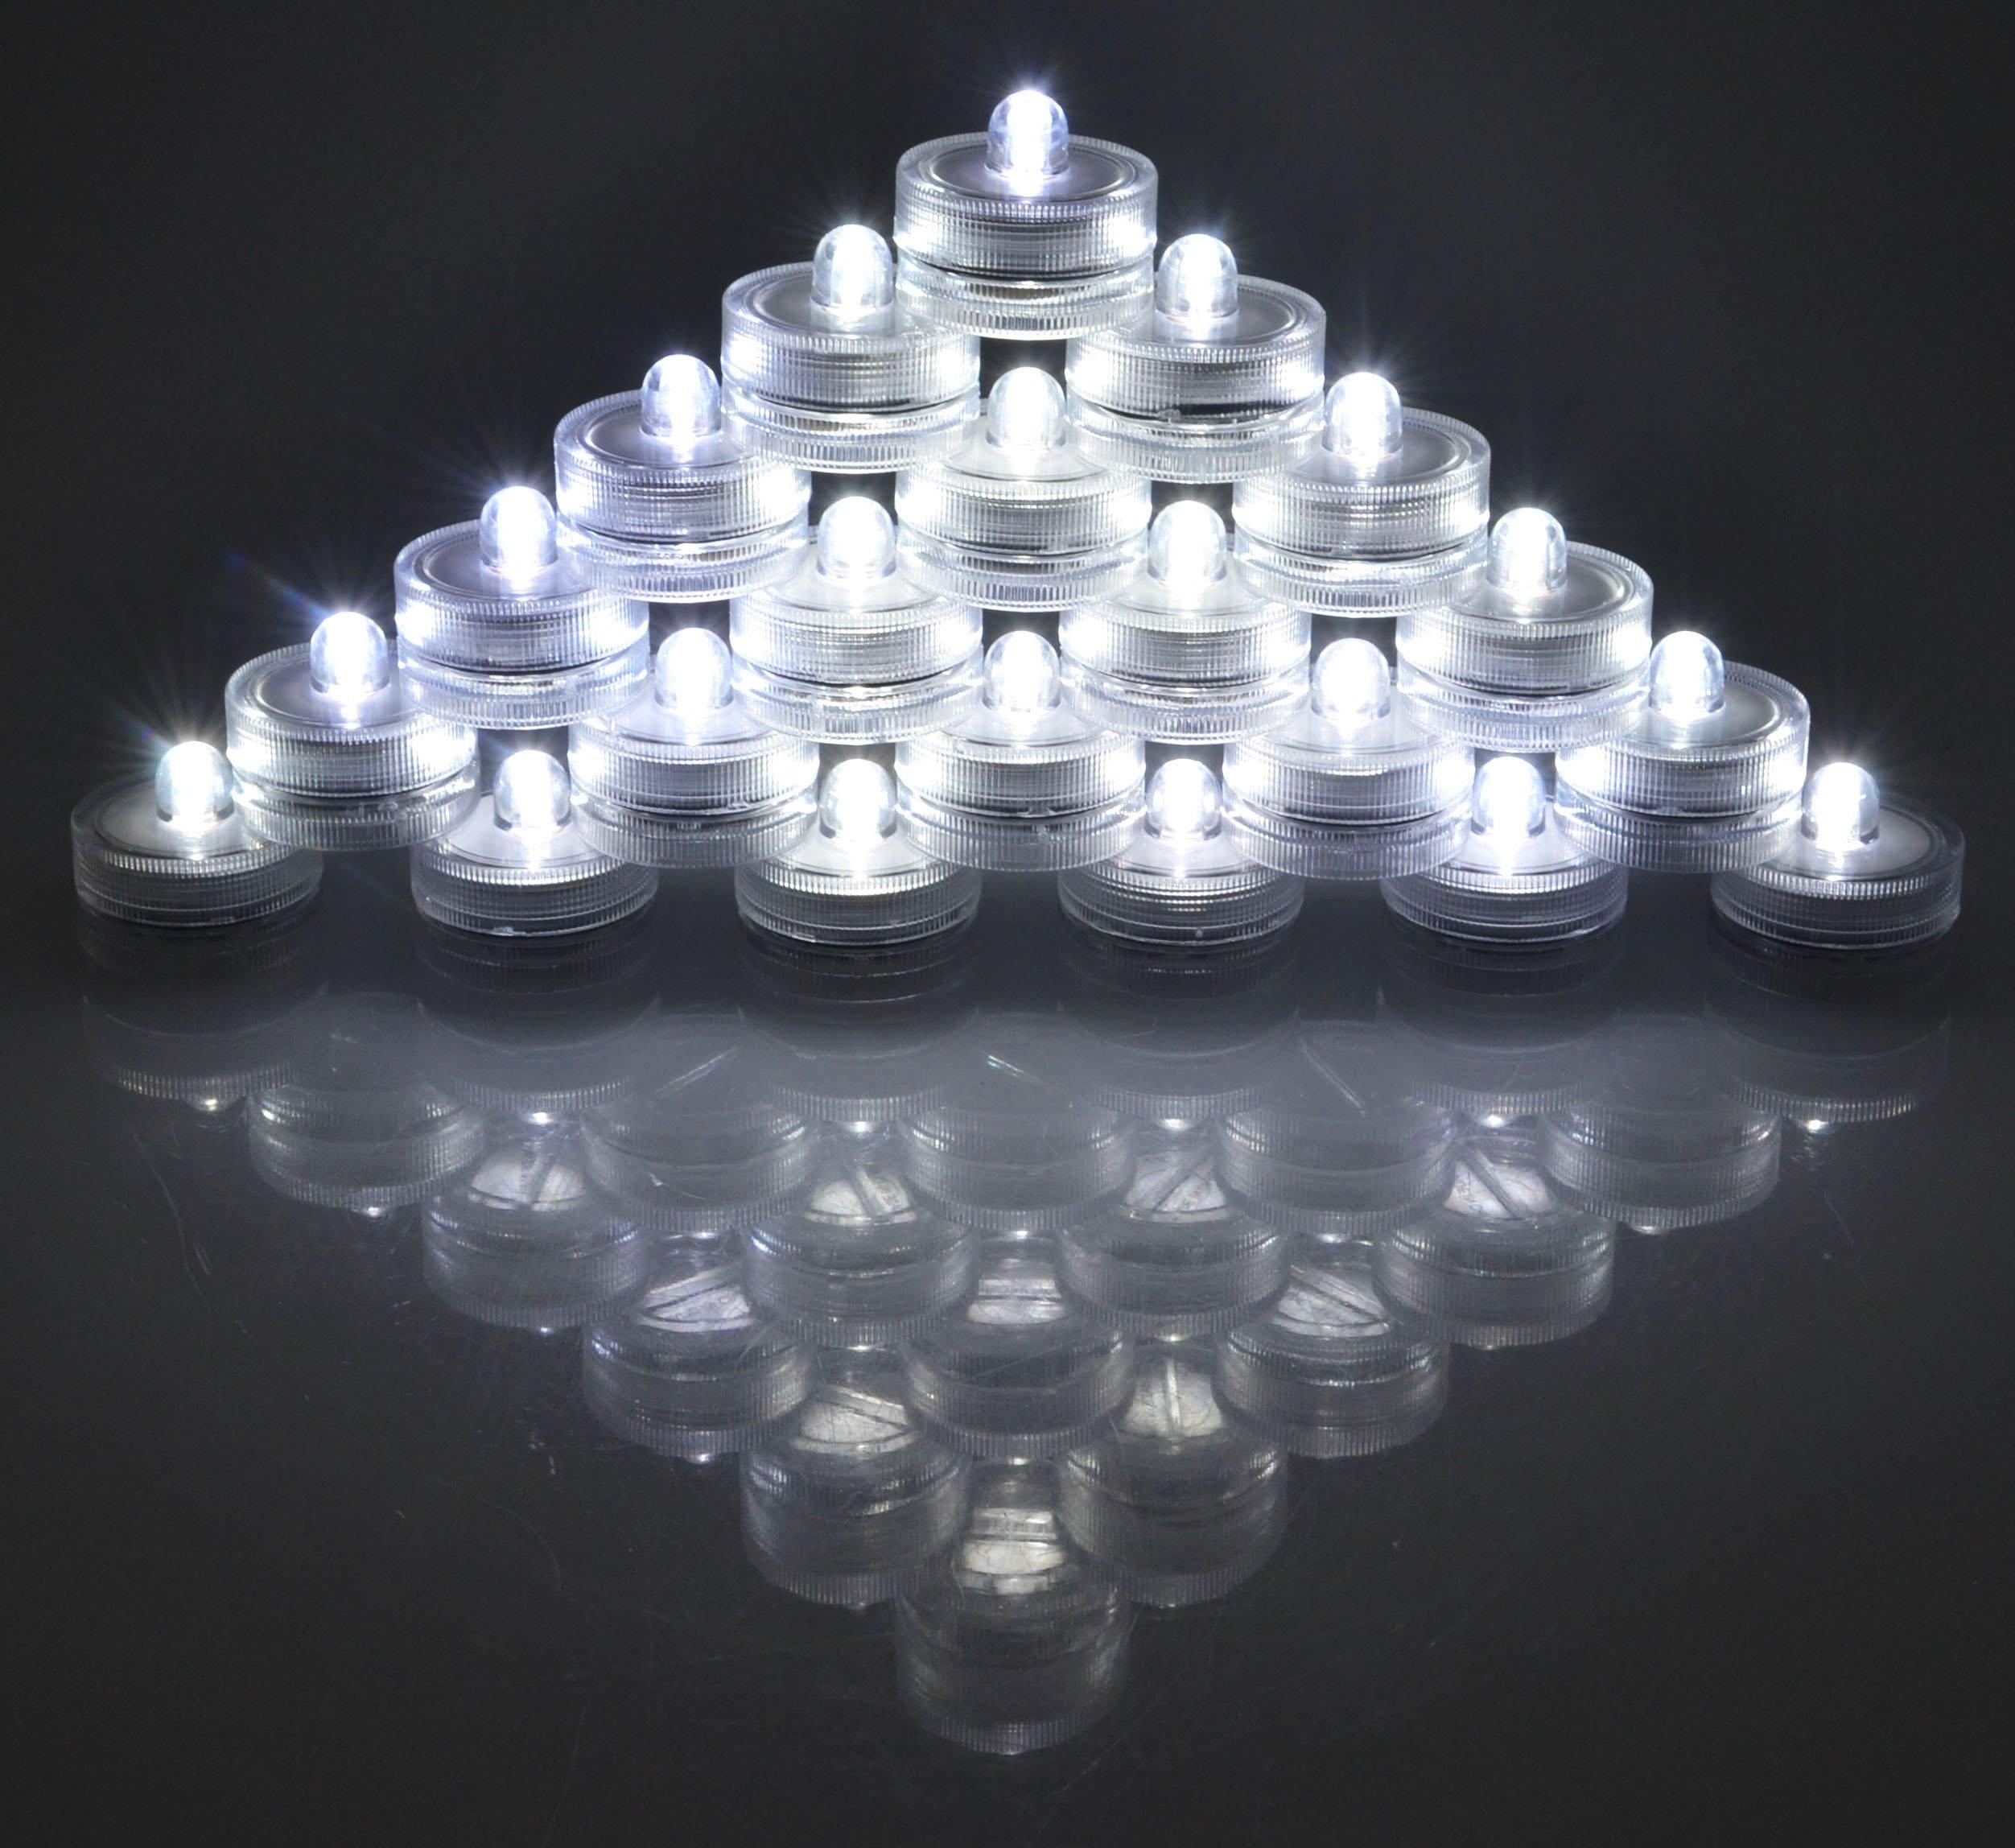 Samyo Set of 36 Waterproof Wedding Submersible Battery LED Tea Lights Underwater Sub Lights- Wedding Centerpieces Party Decorate (White) by Samyo (Image #1)